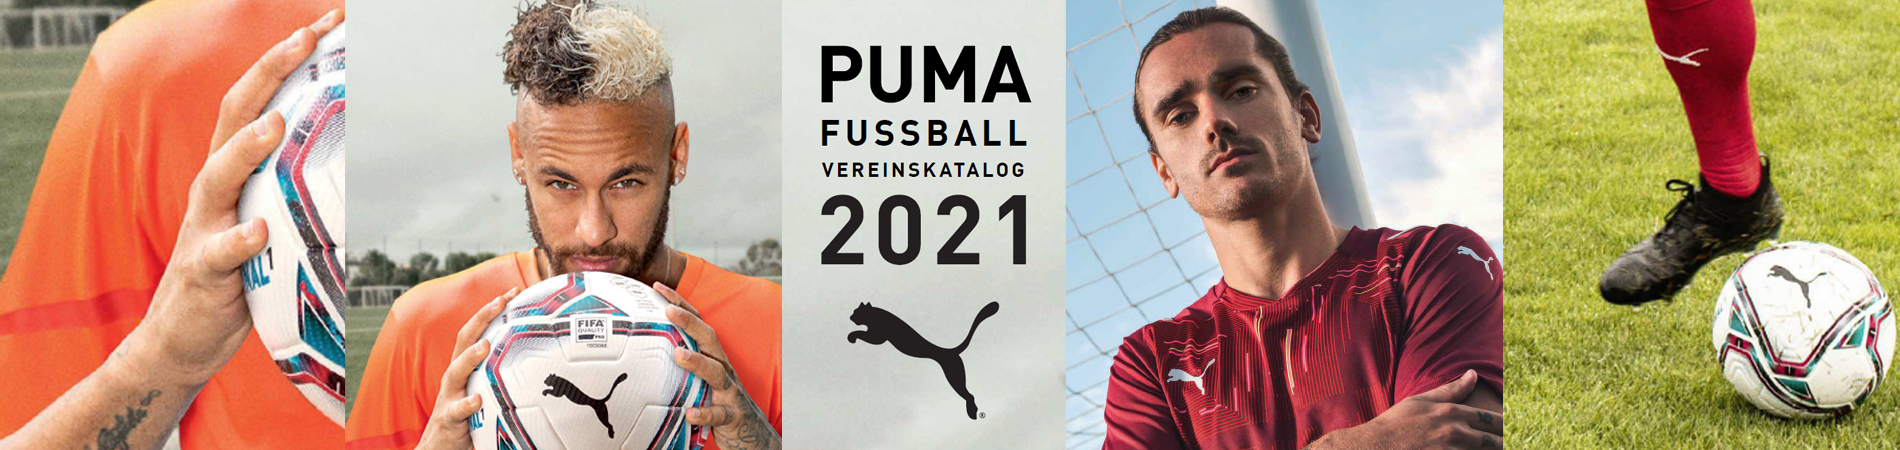 Puma_Vereinskatalog_Header 1900x450